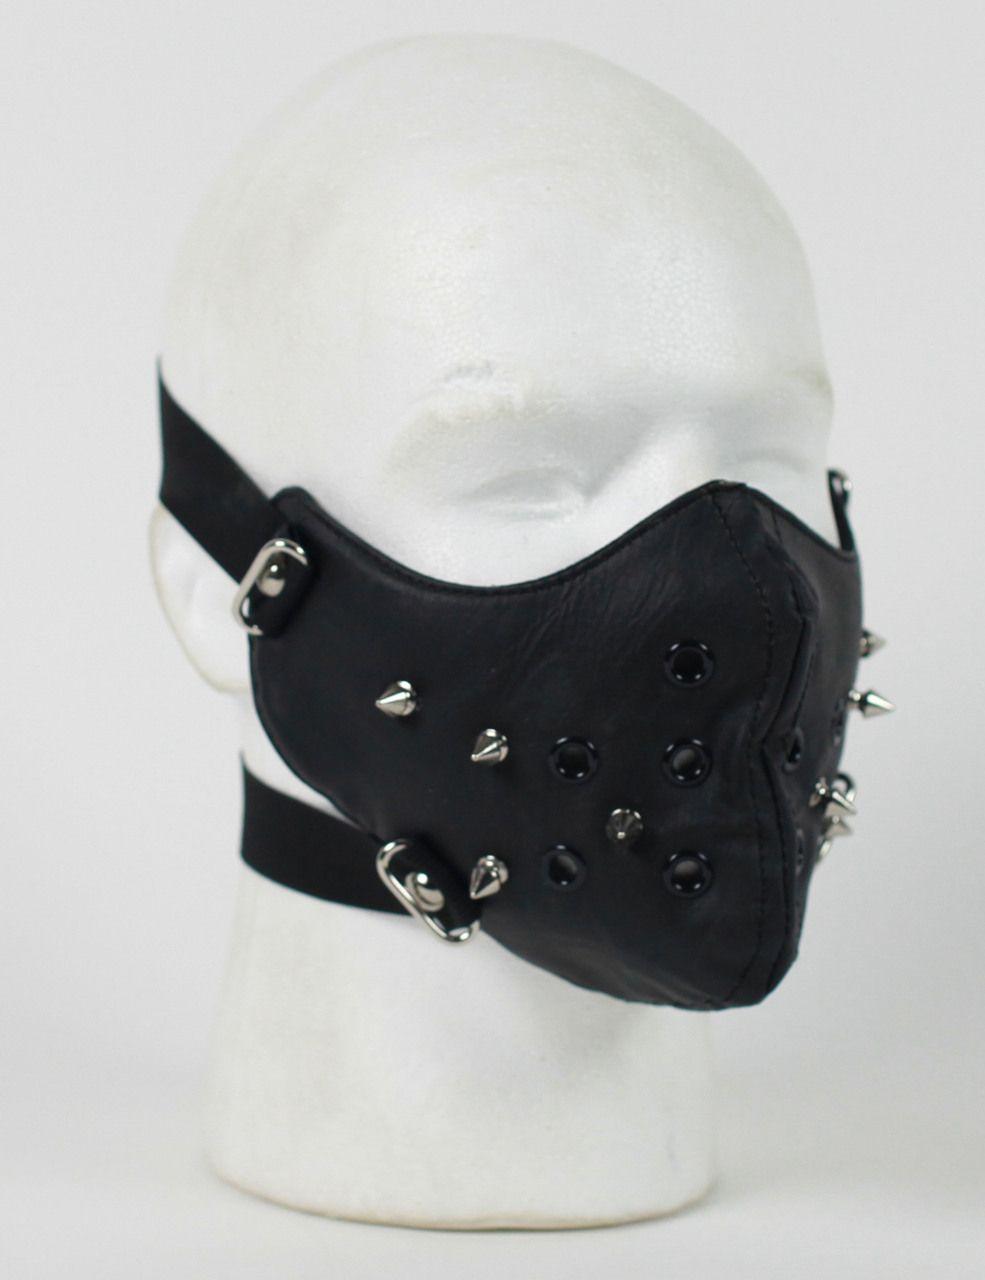 151fcb9e202 Punk Rivet Black Leather Half Face Mask in 2019